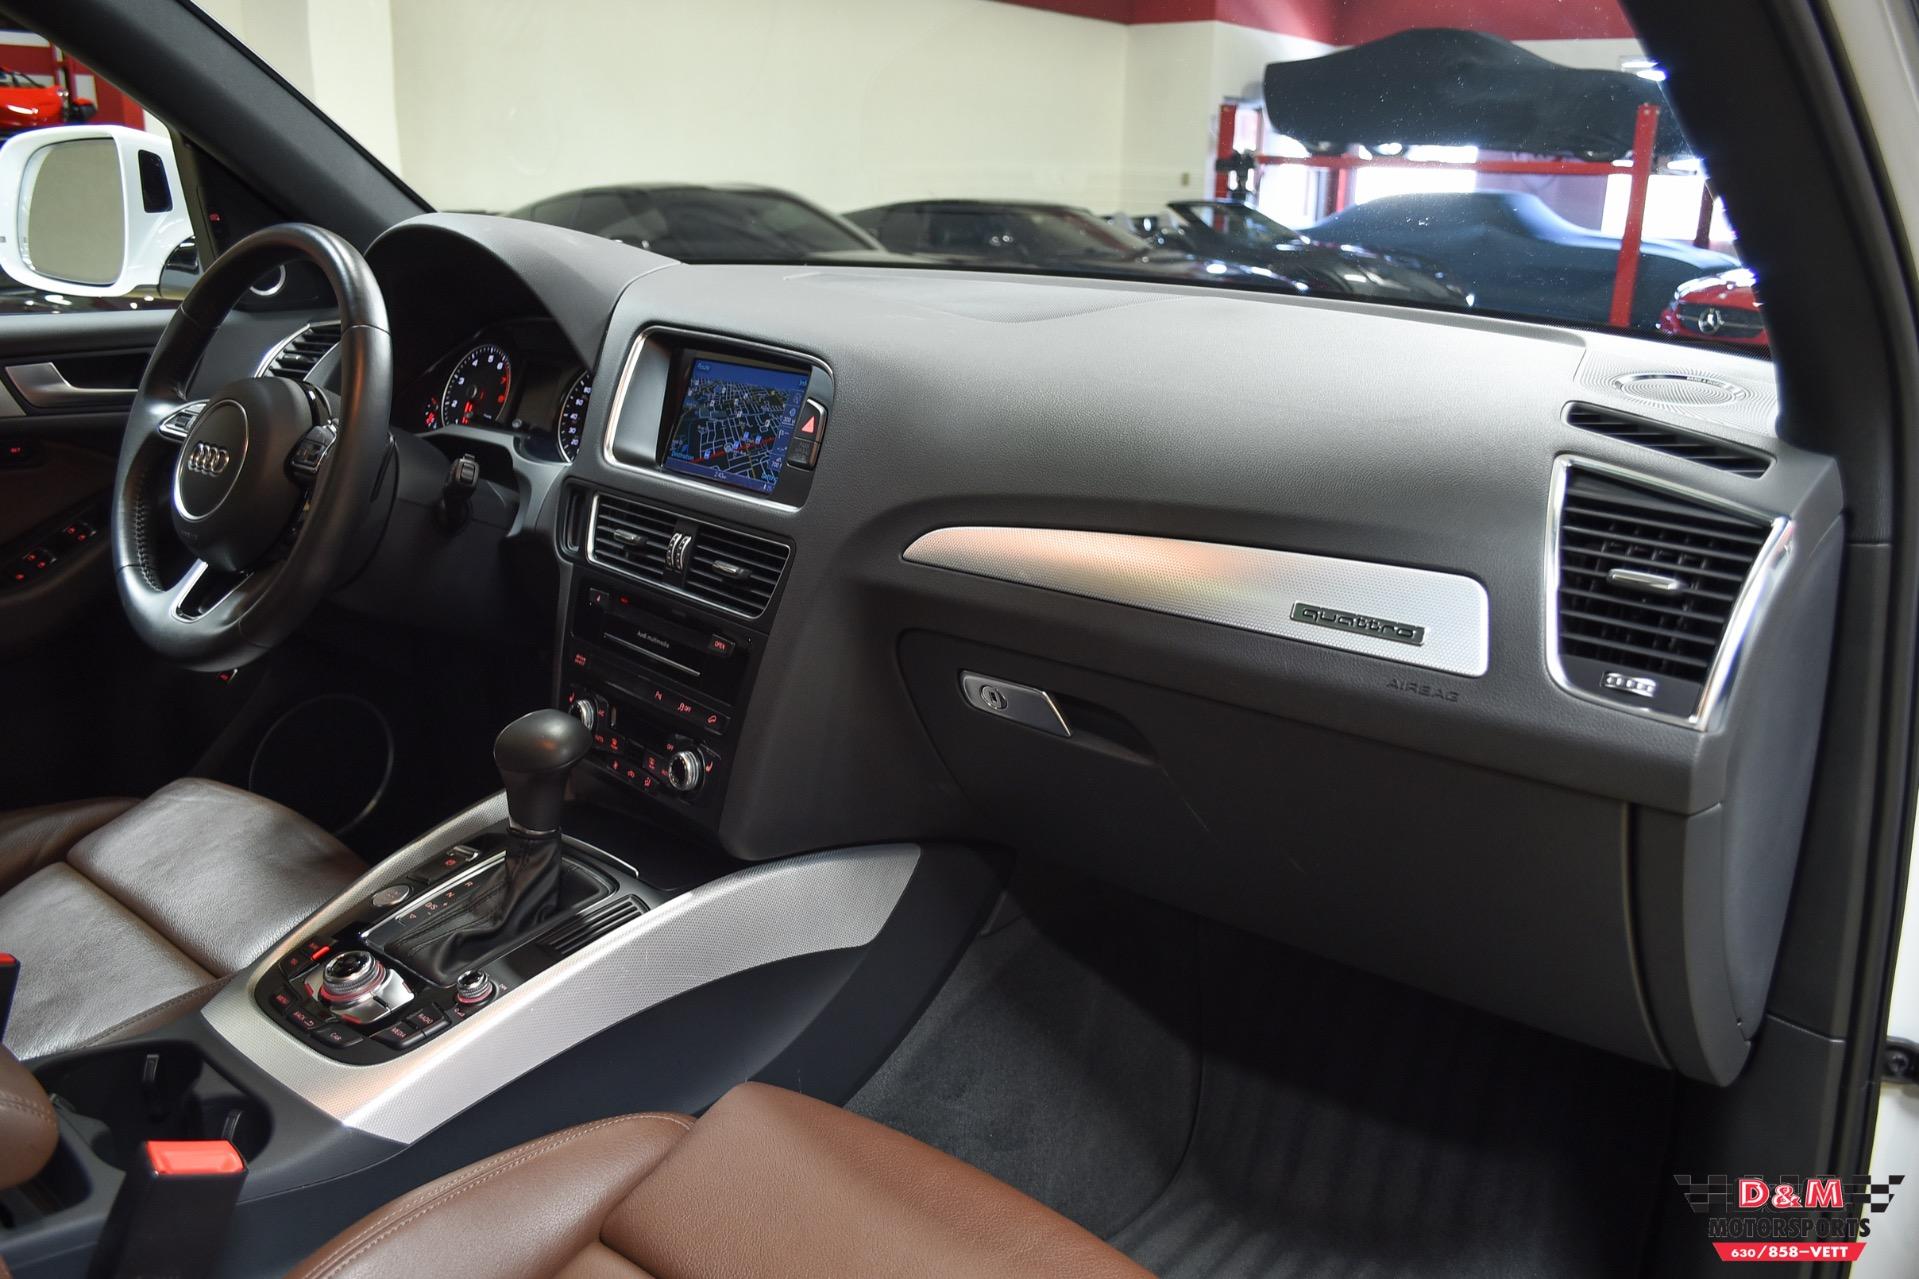 Used 2017 Audi Q5 2.0T quattro Premium Plus | Glen Ellyn, IL